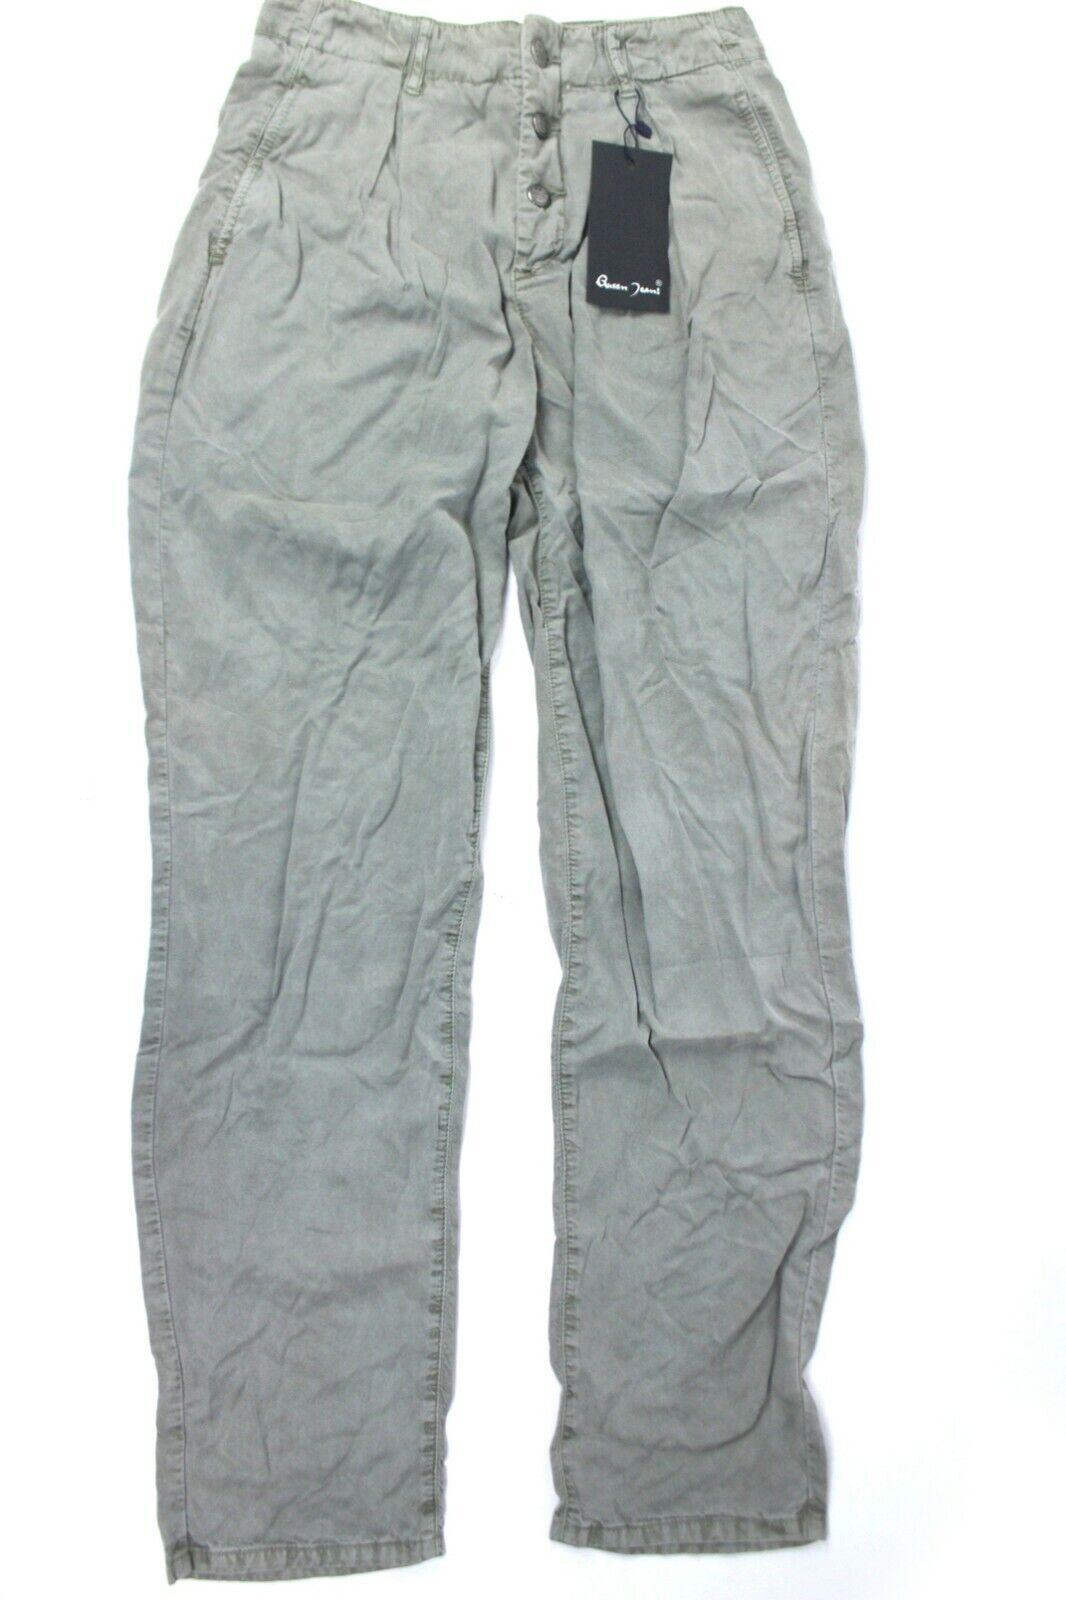 Queen Jeans Damen Jeans Hose Style Golden Gr. 28 Grau Tancel leichte Sommerhose